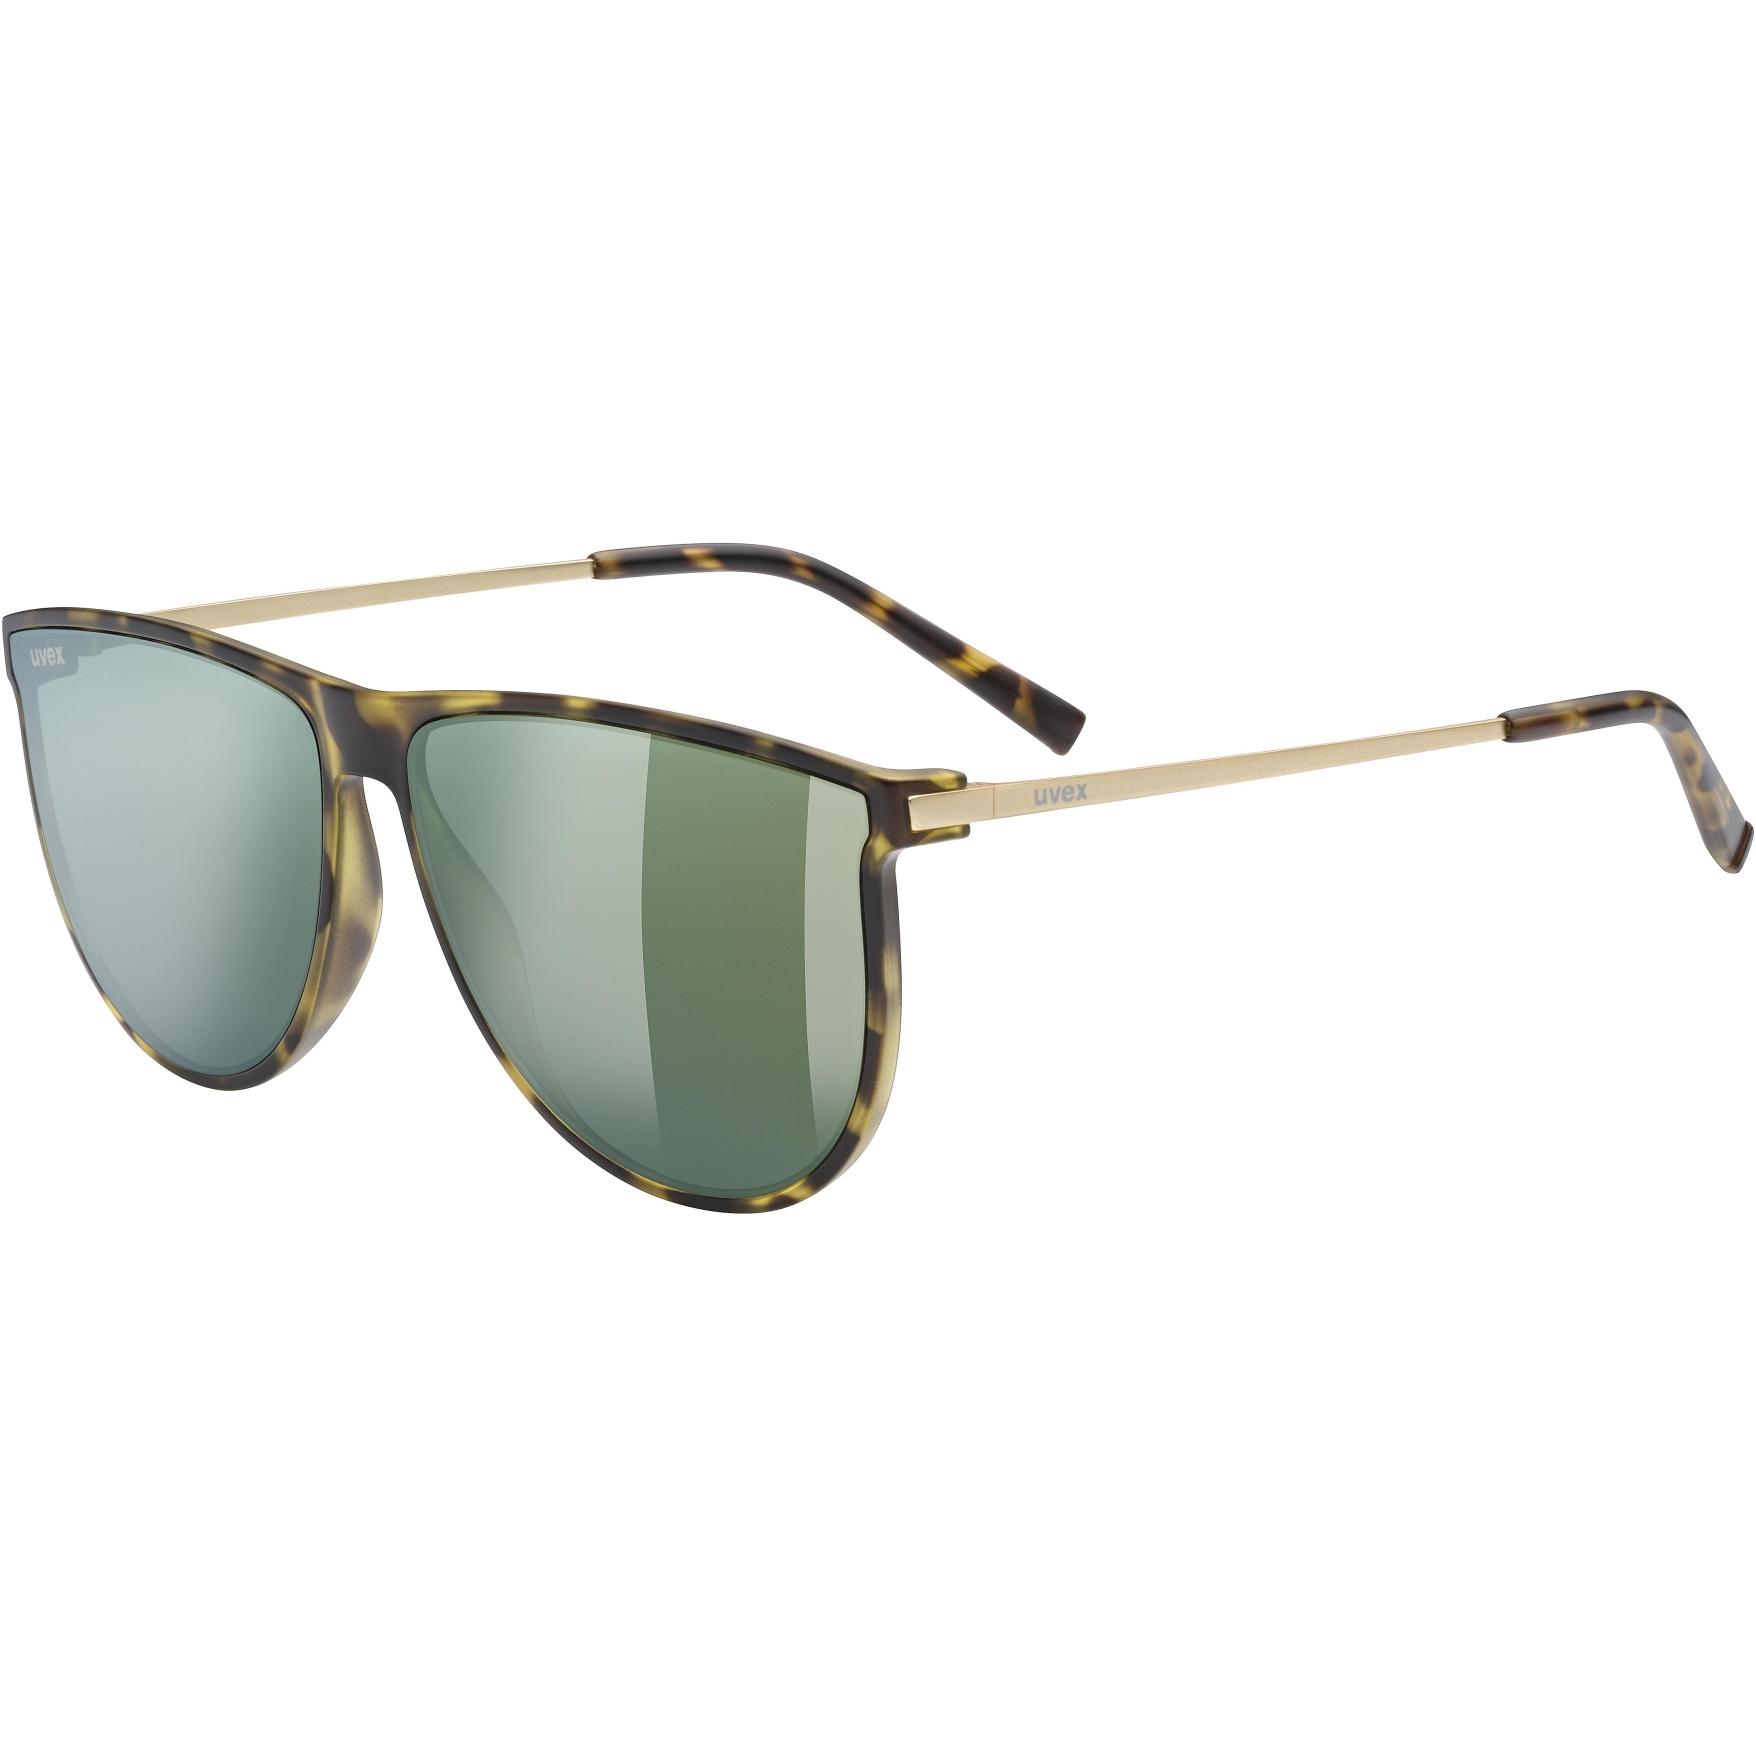 Uvex lgl 47 Glasses - havanna mat/mirror green